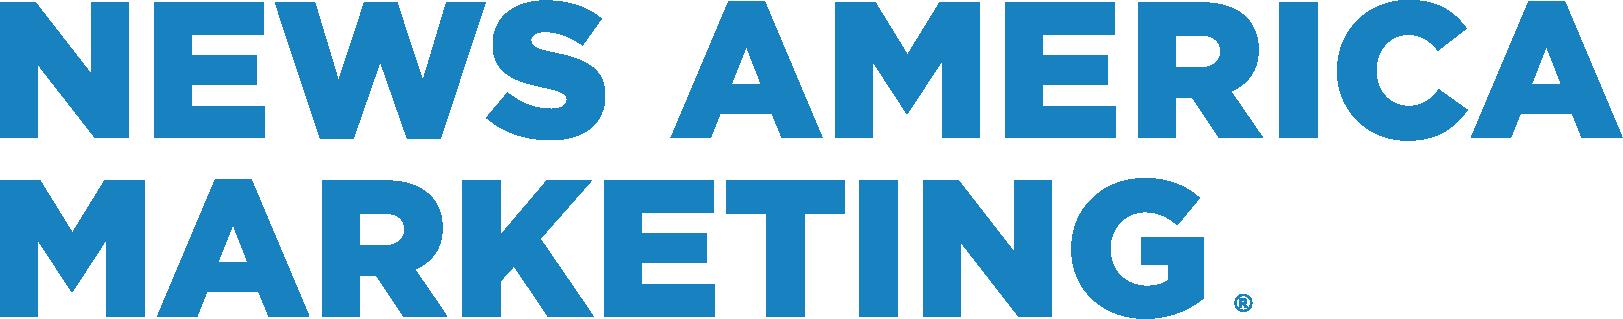 News America Marketing